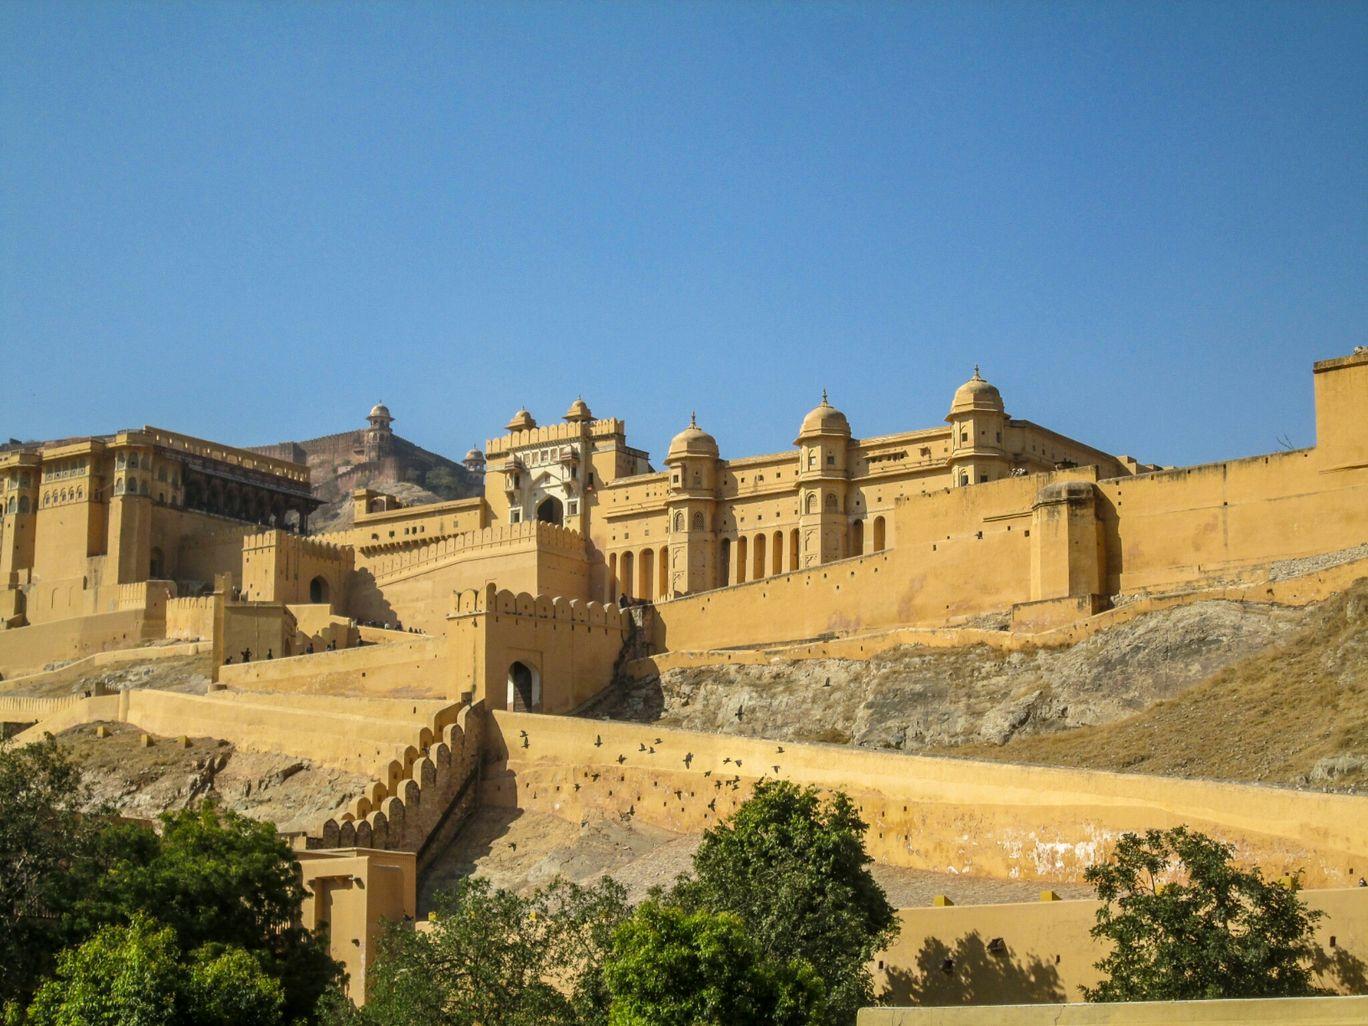 Photo of Amer Fort By manish tripathi